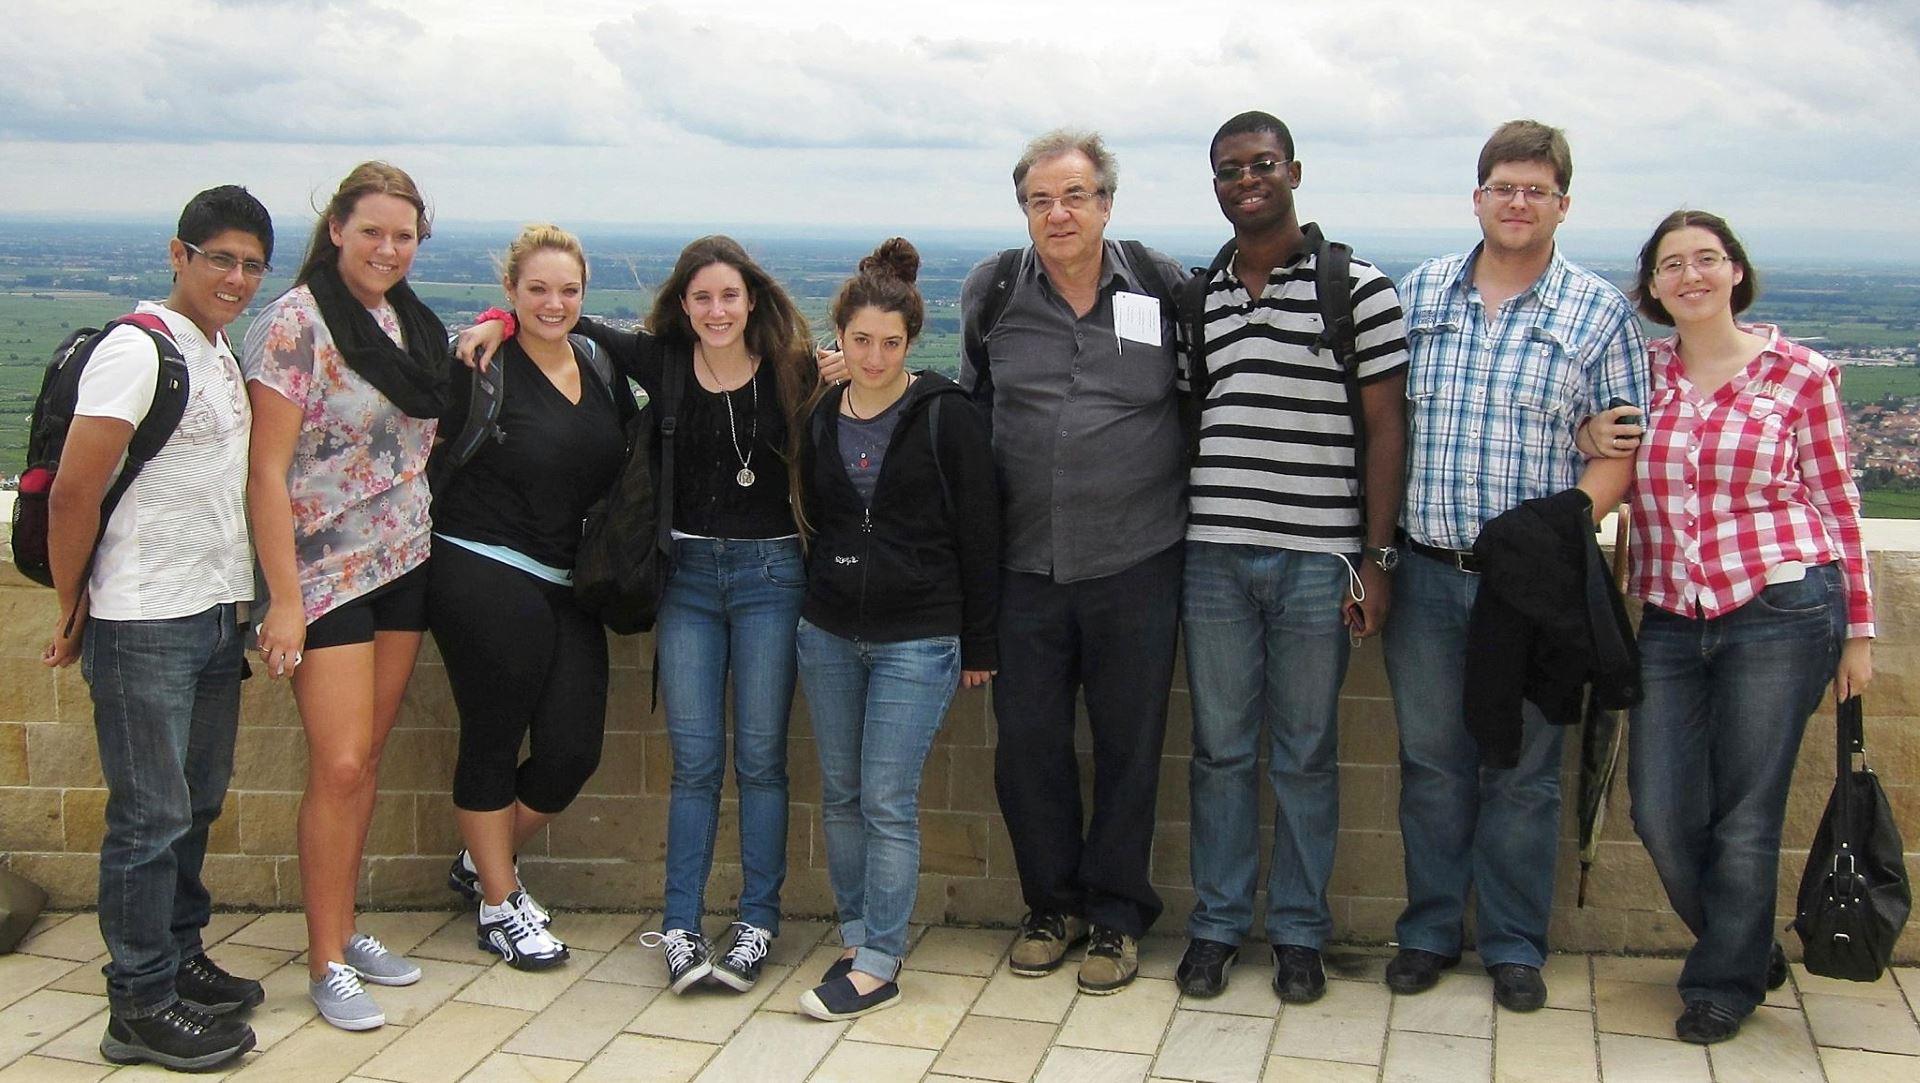 Gruppenfoto auf dem Hambacher Schloss